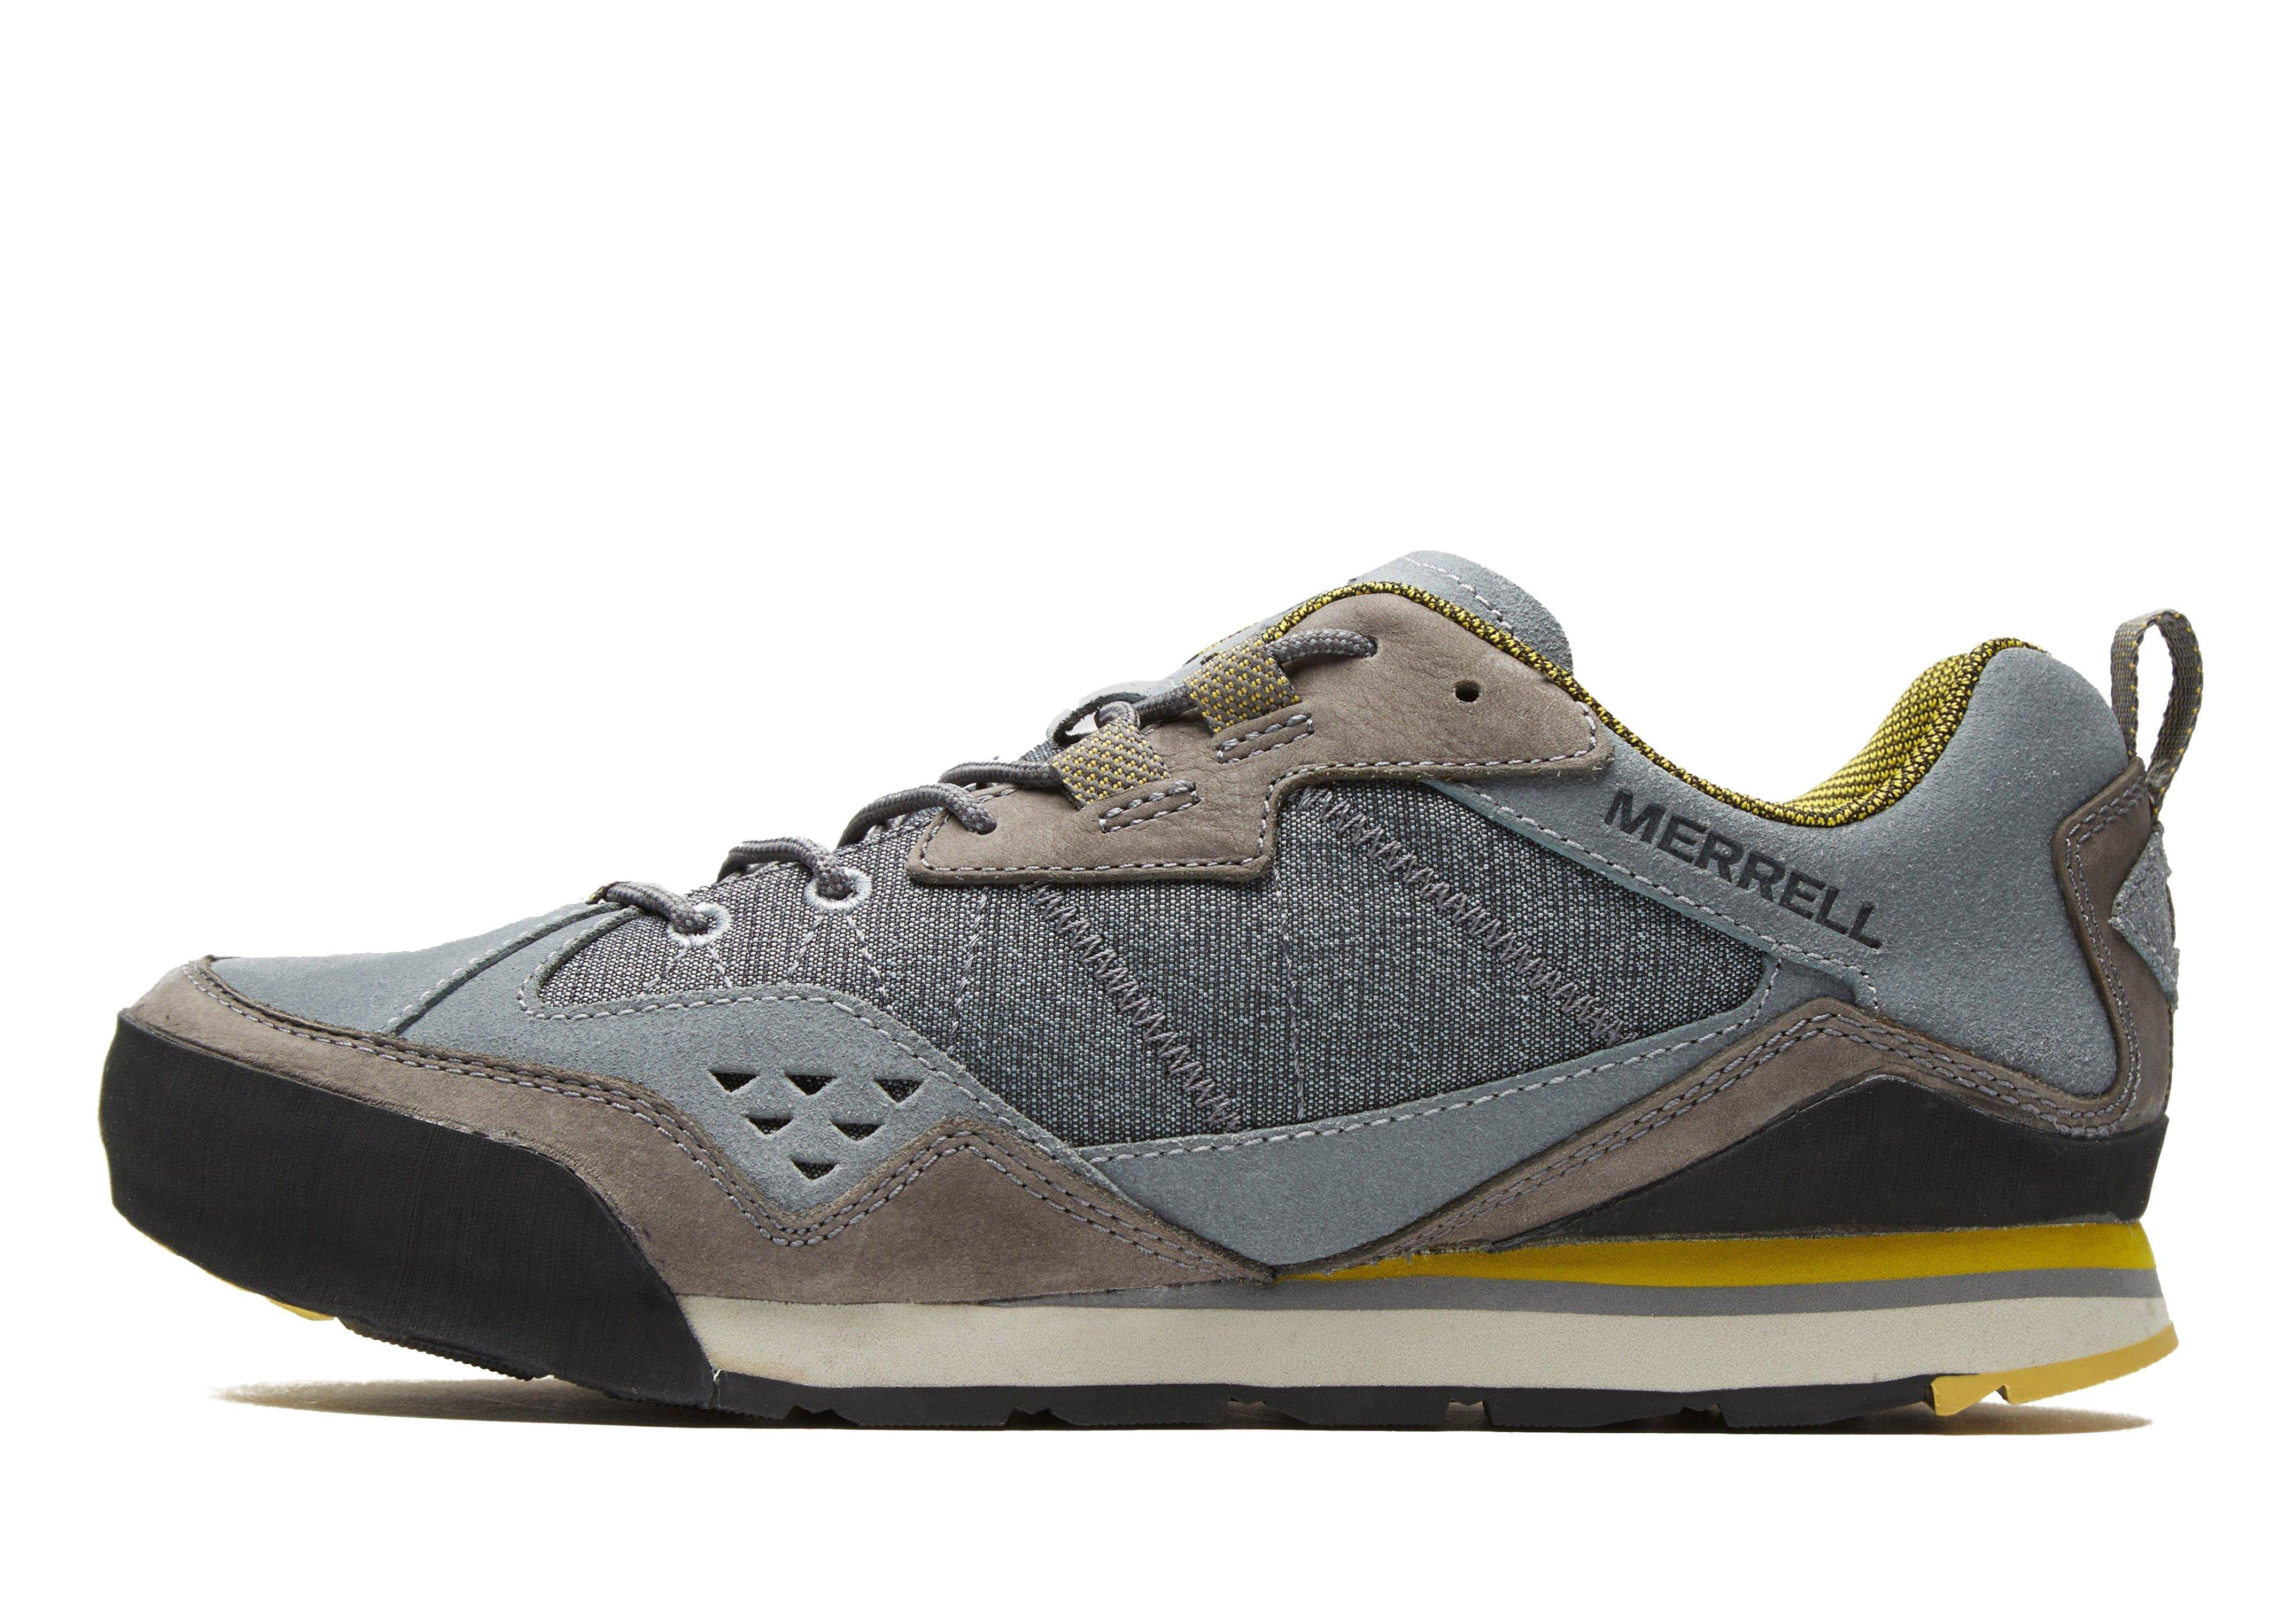 2c4c85835a48 Merrell Burnt Rock Walking Shoes in Gray for Men - Lyst